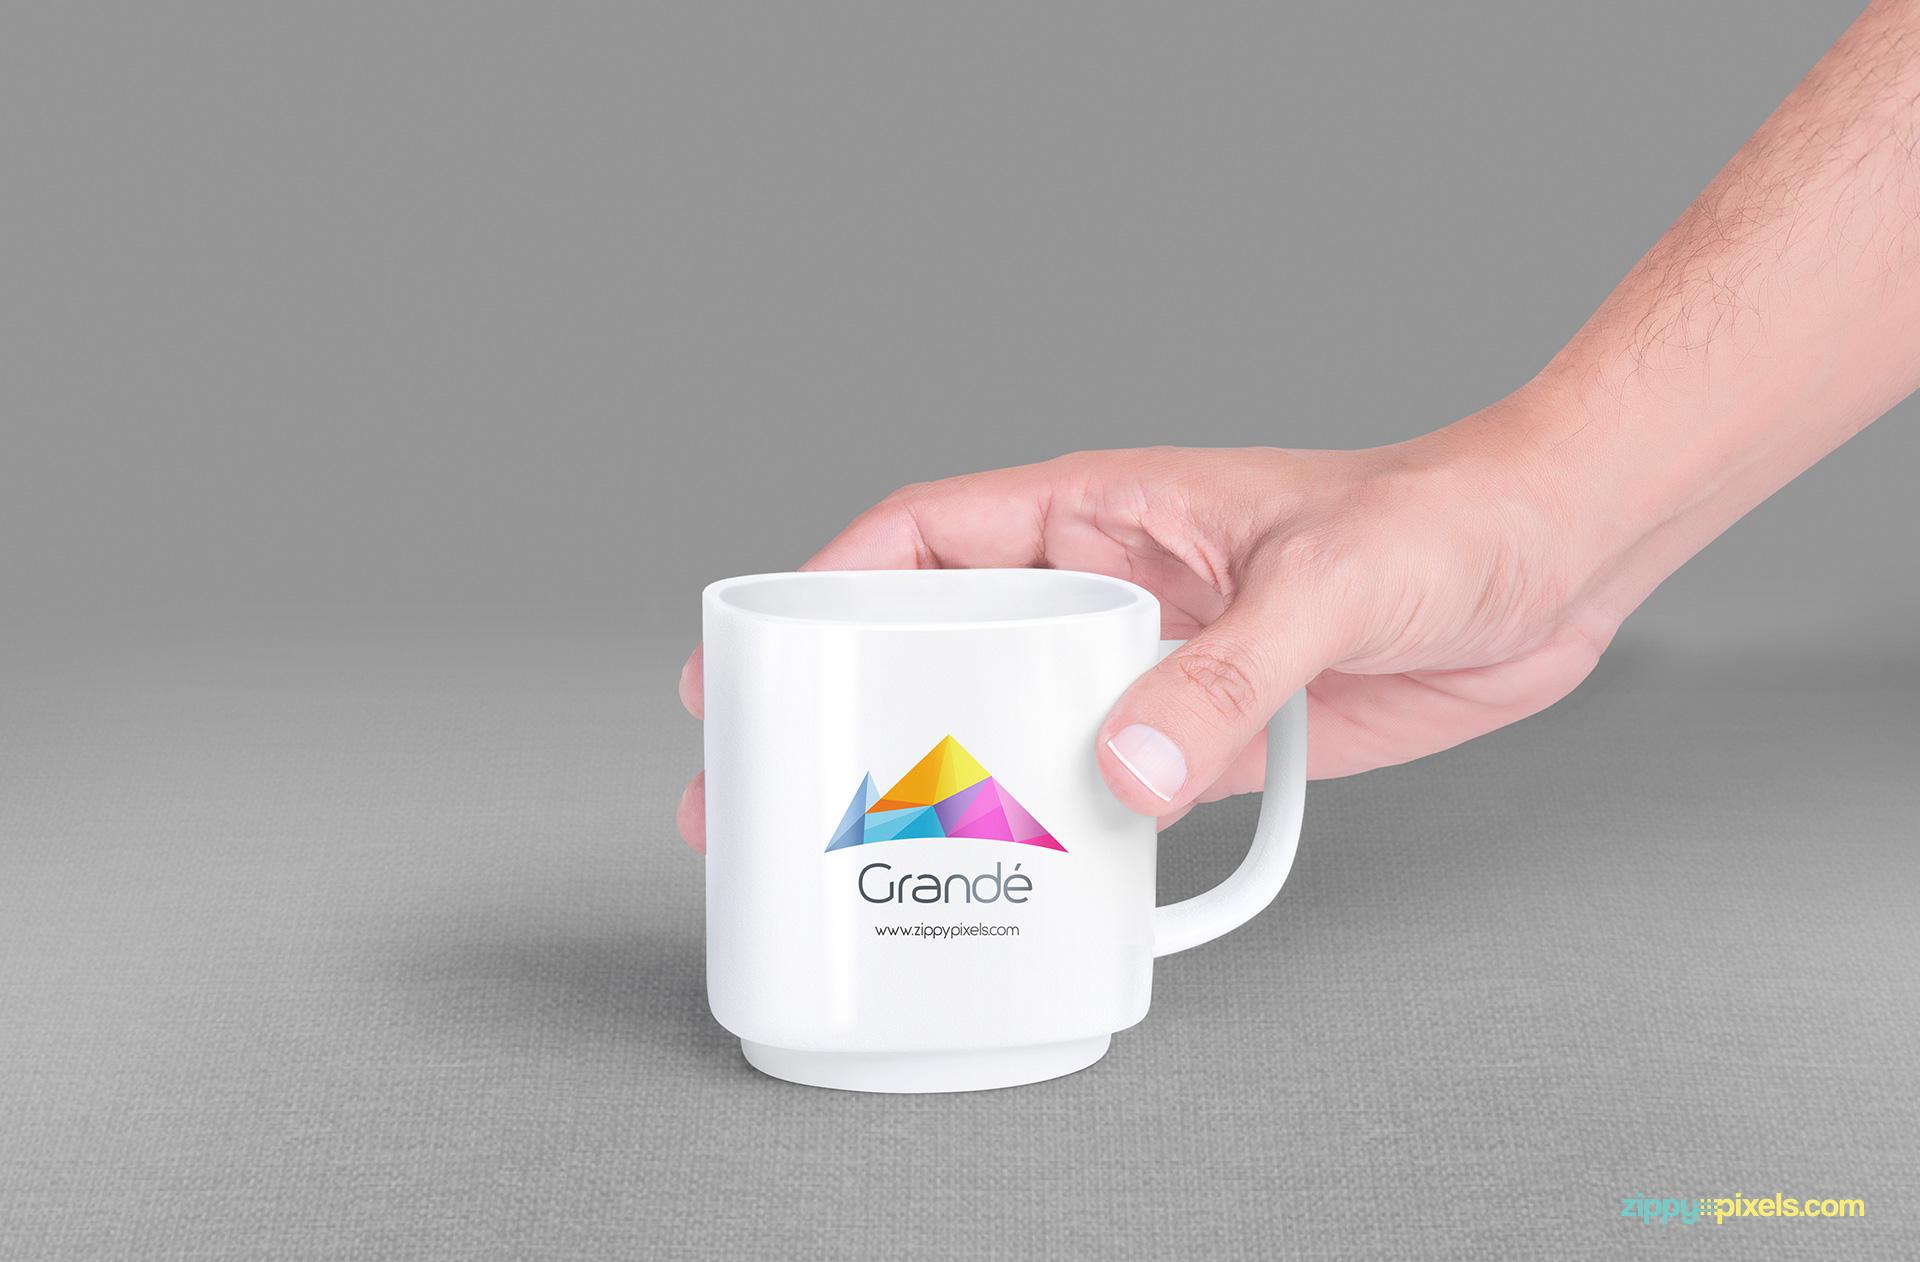 Mug mock-up PSD to place your logo designs.